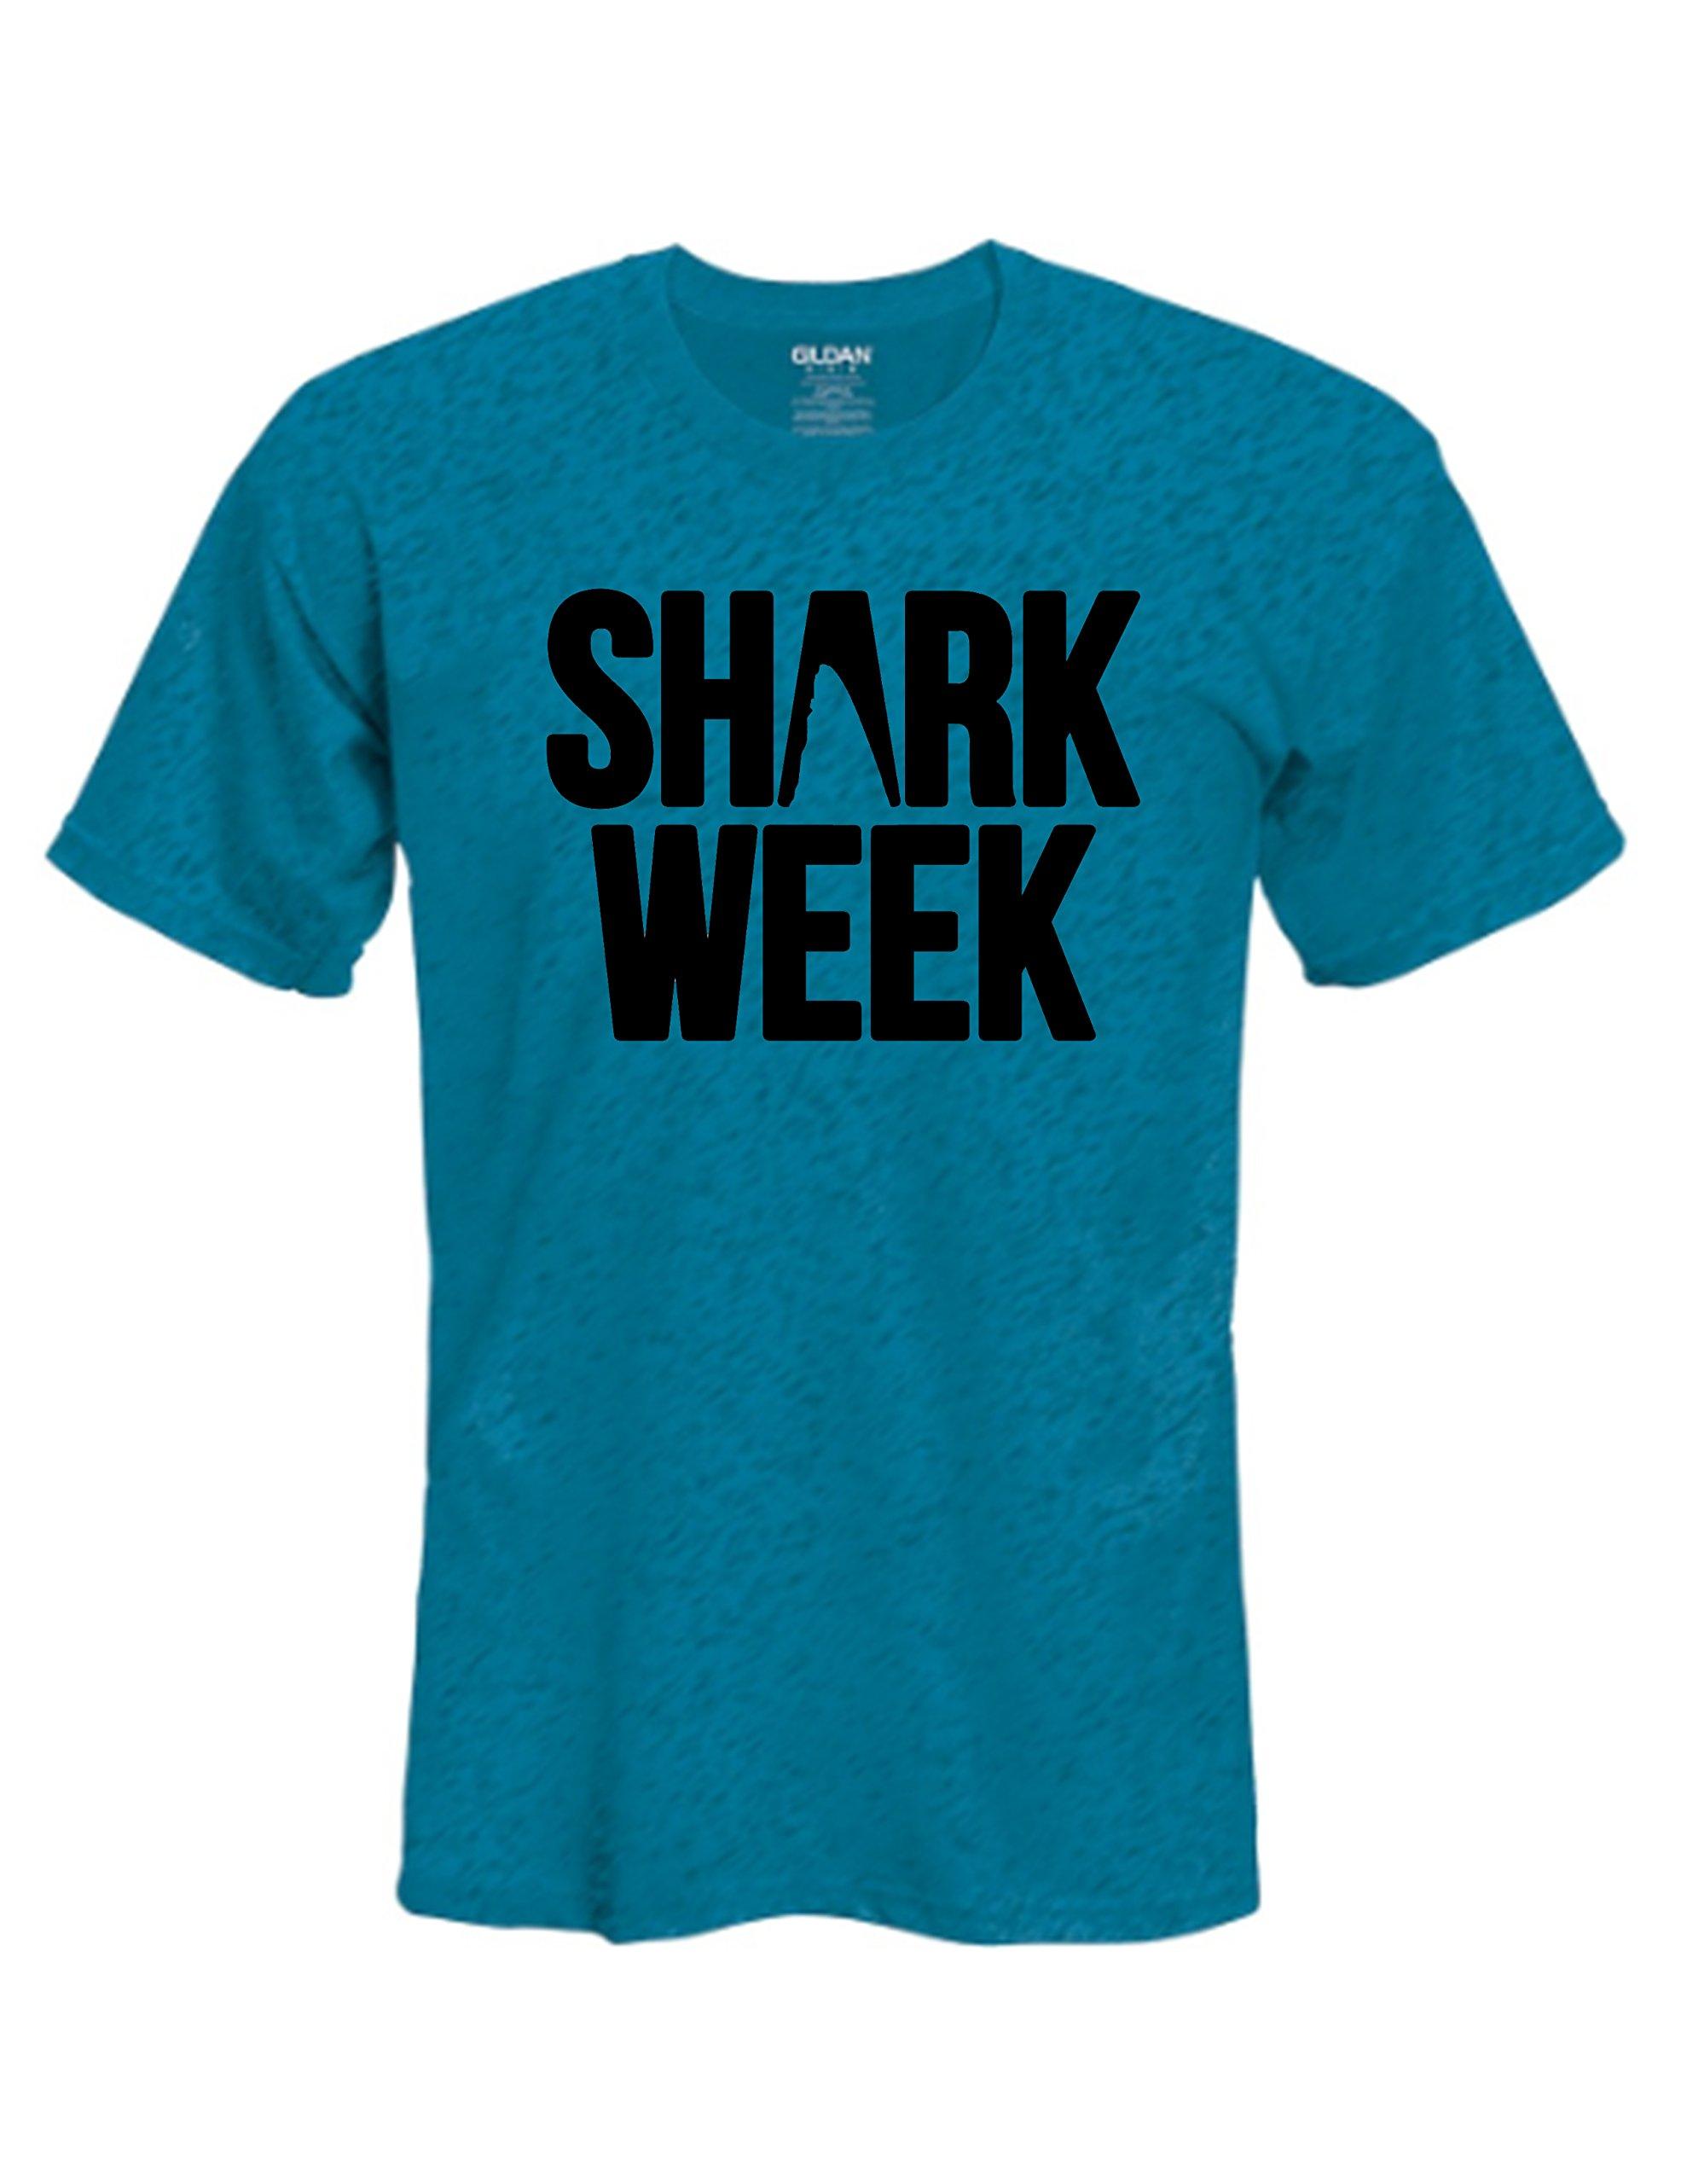 Shark Week Mens/Womens T-Shirt - Pick T-Shirt Color, Size and Design Color